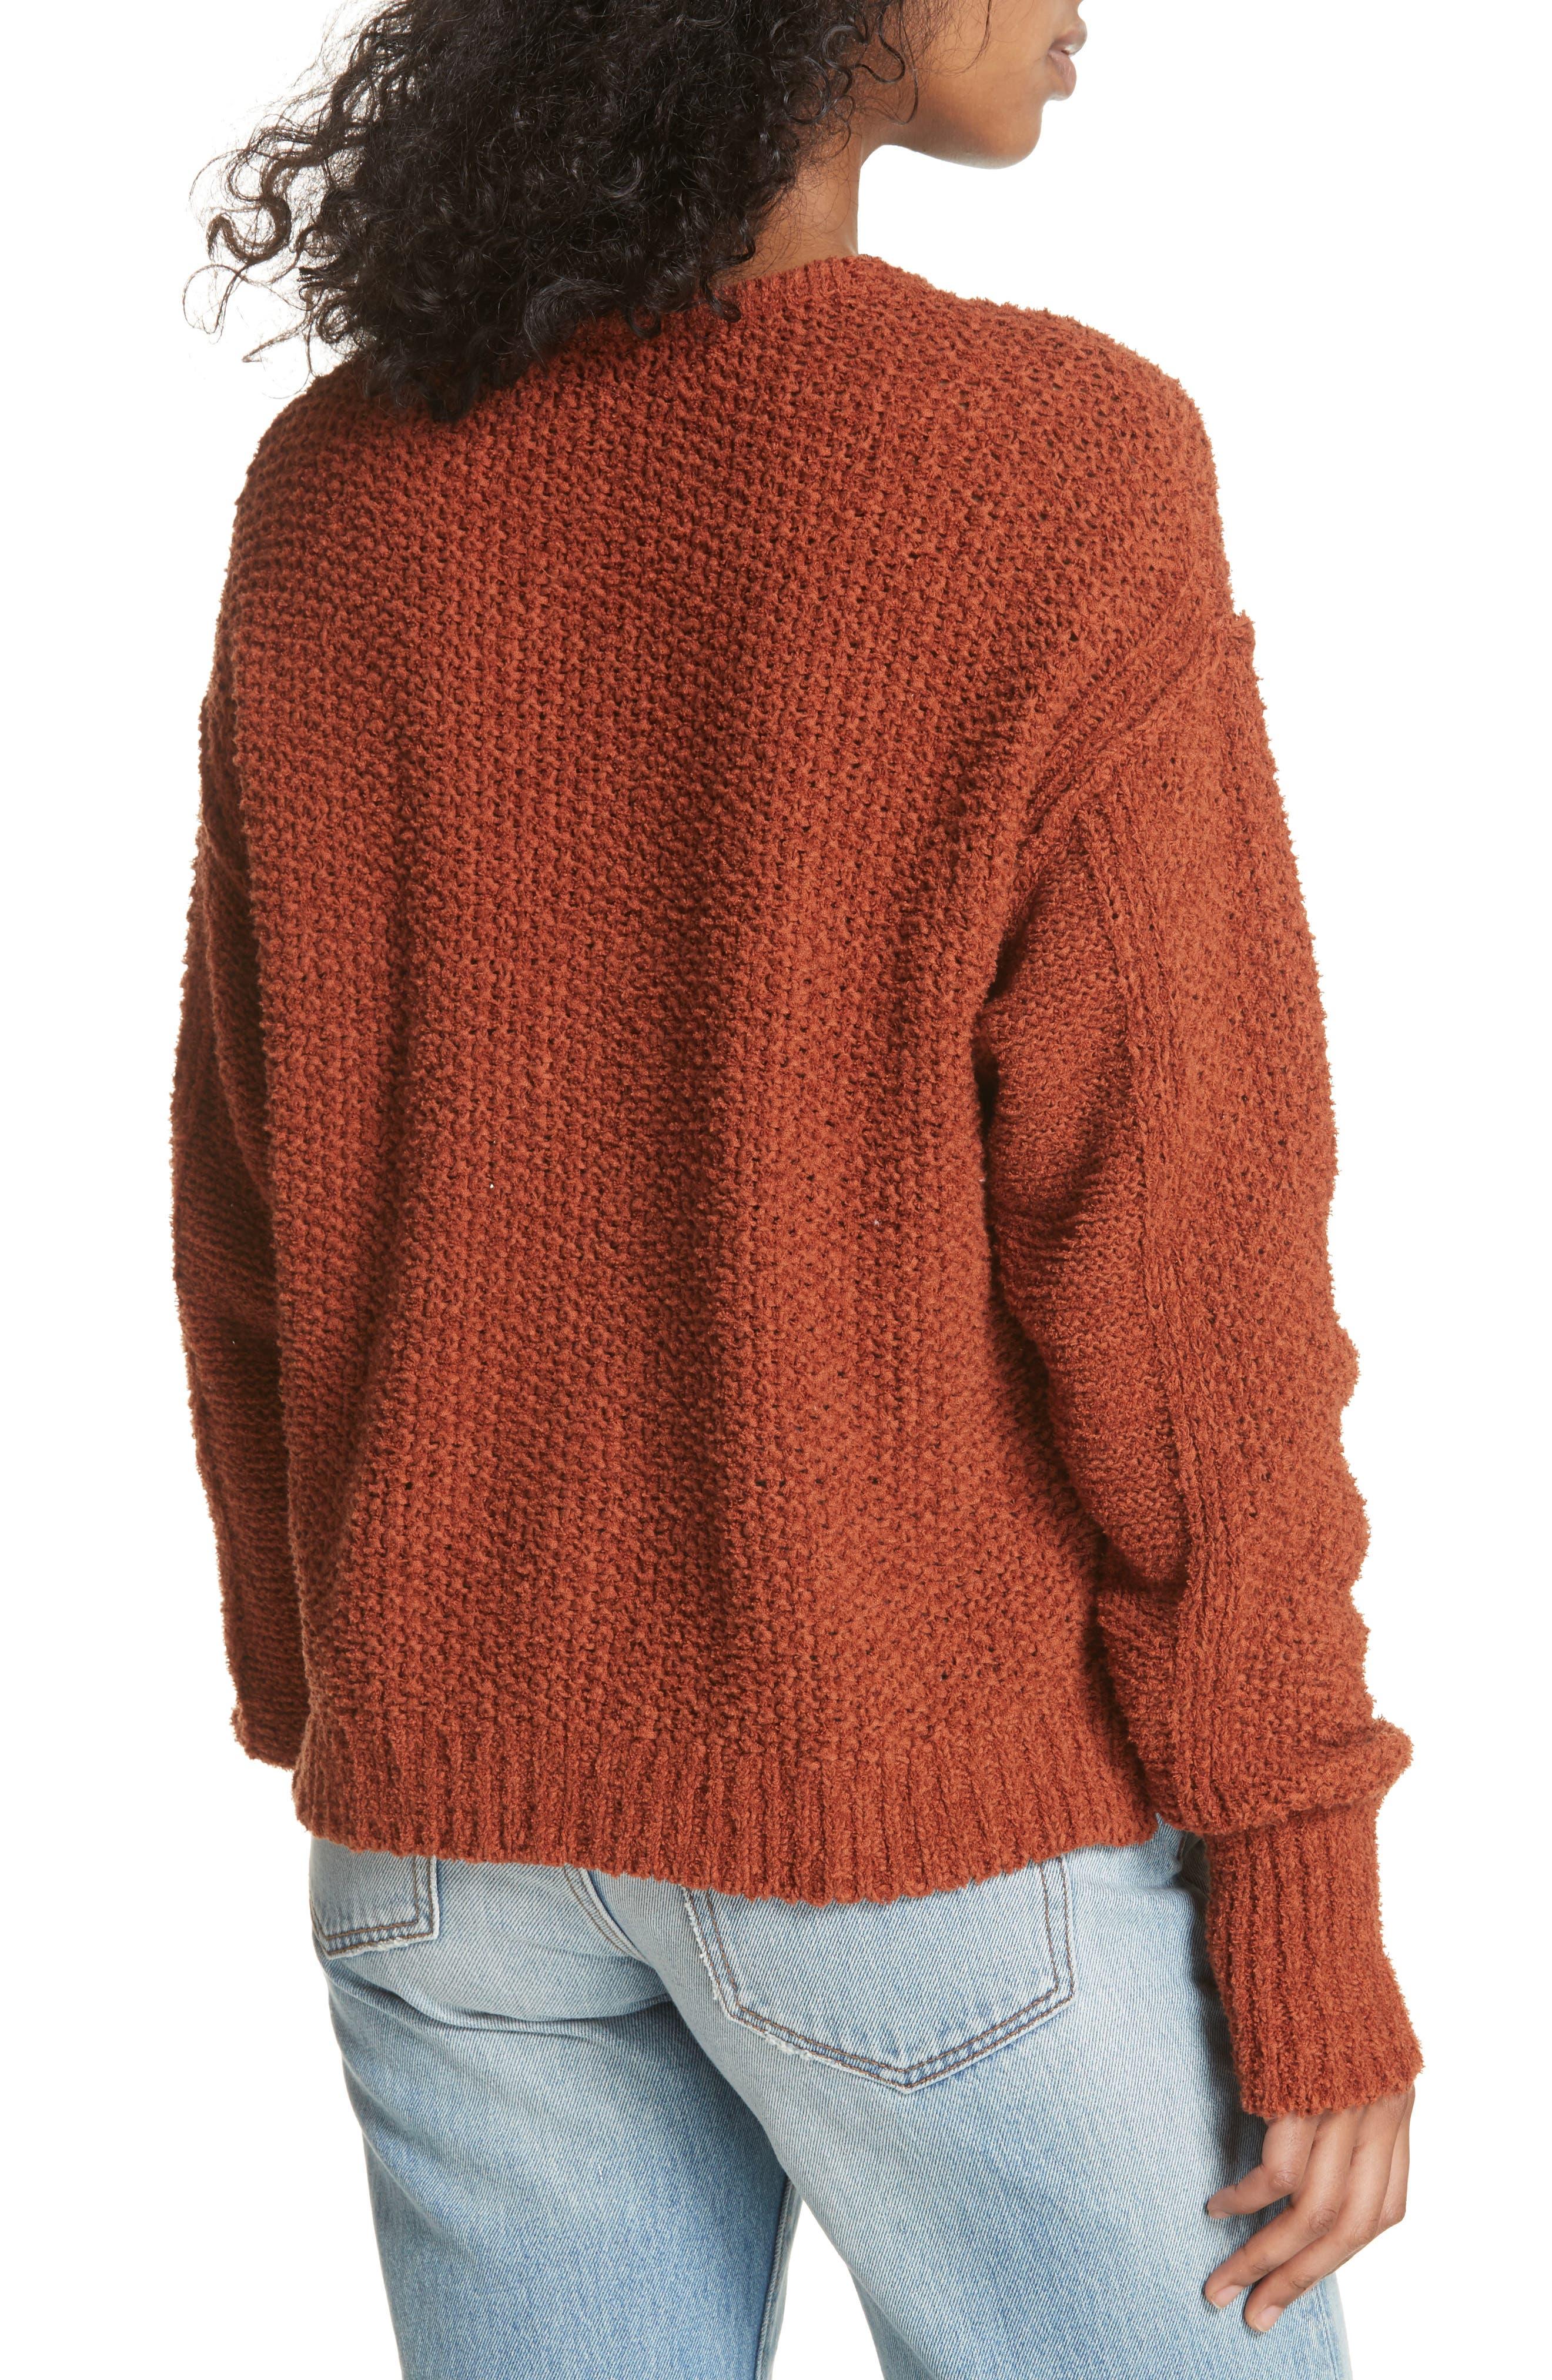 Coco V-Neck Sweater,                             Alternate thumbnail 2, color,                             Terracotta